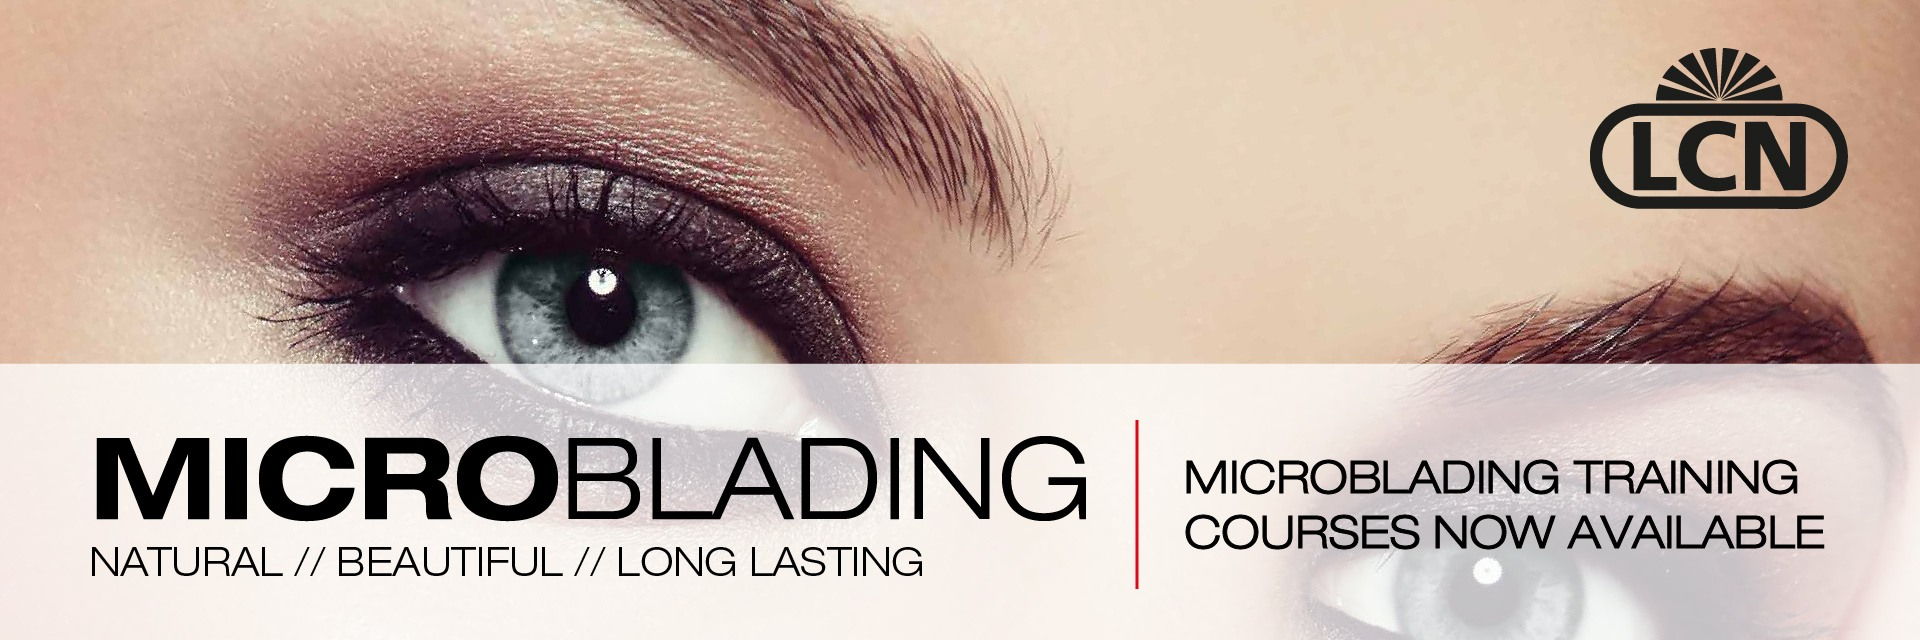 Microblading Training LCN